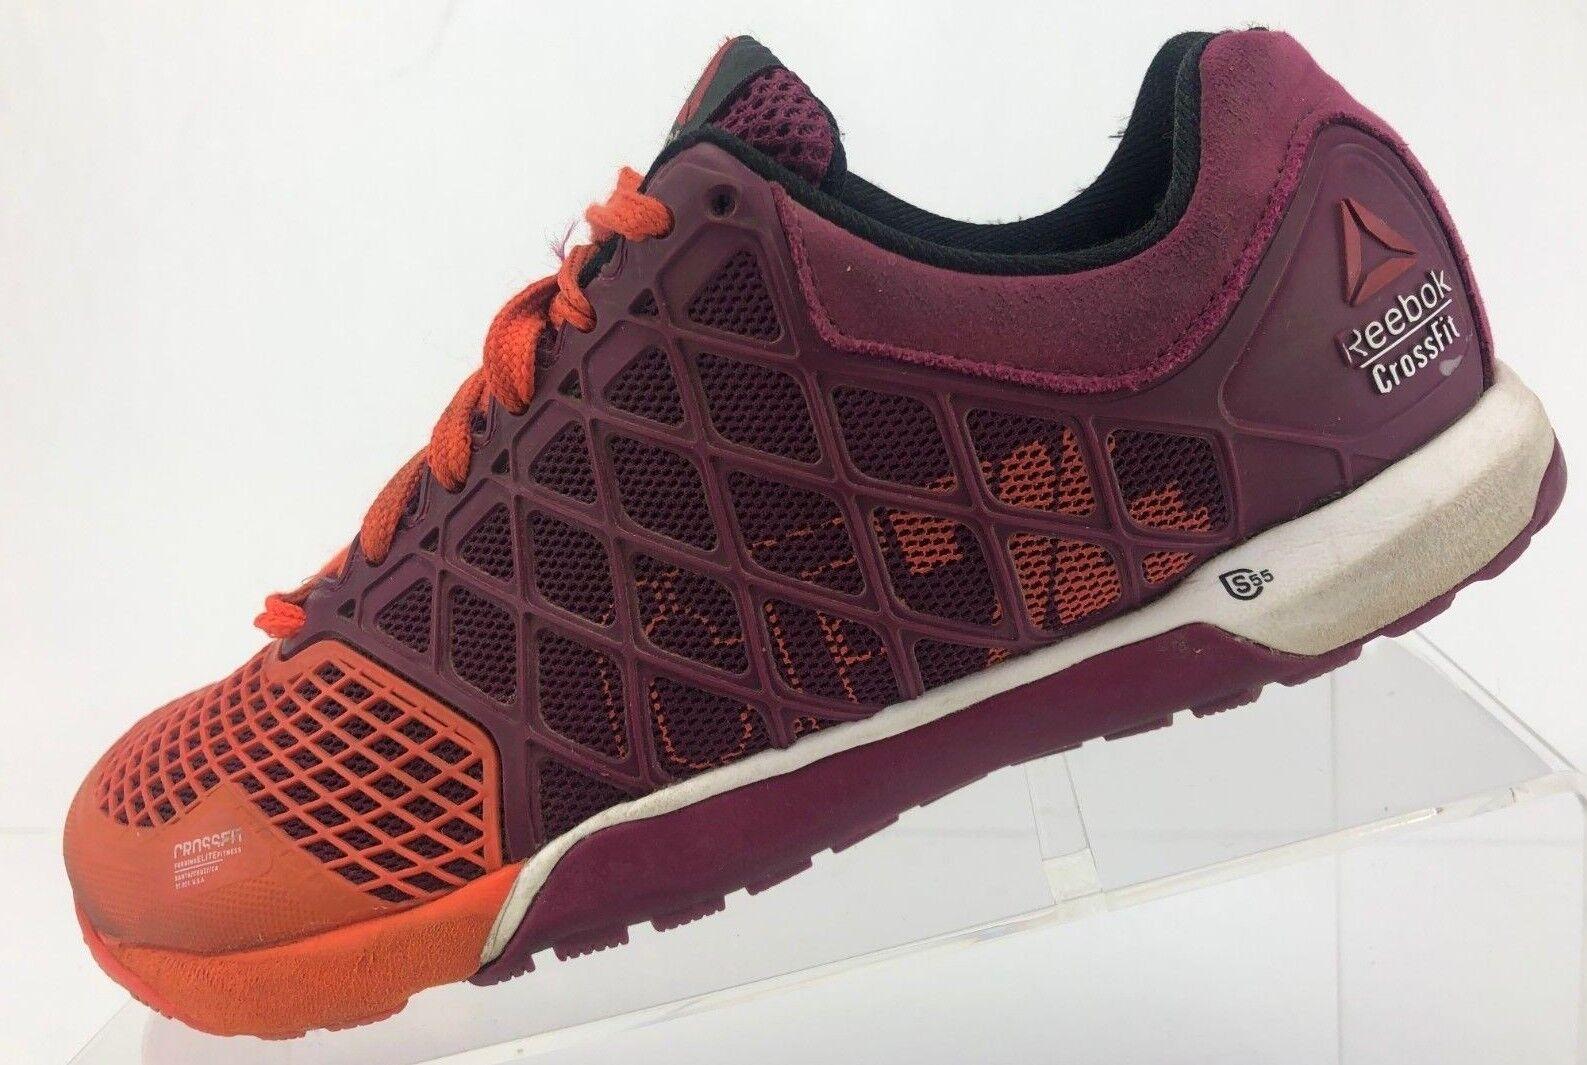 Reebok Crossfit Nano 4.0 Running shoes orange Purple Training Sneaker Womens 7.5